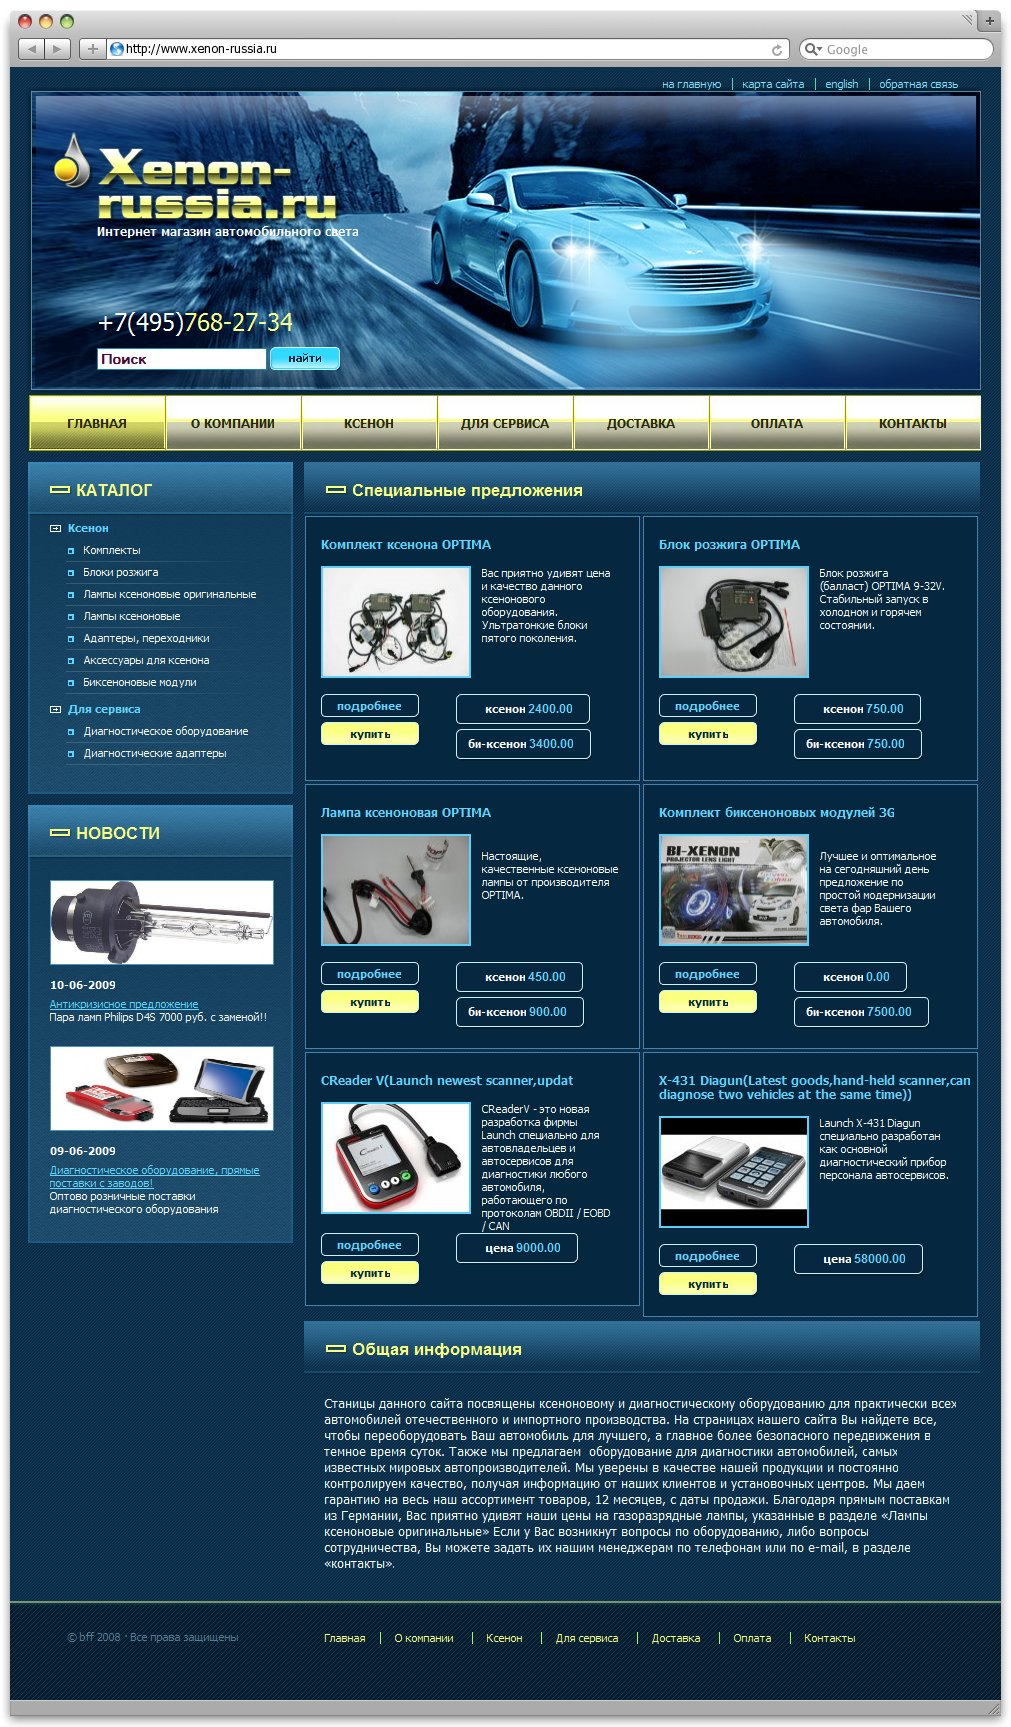 Xenon - магазин автомобильного света